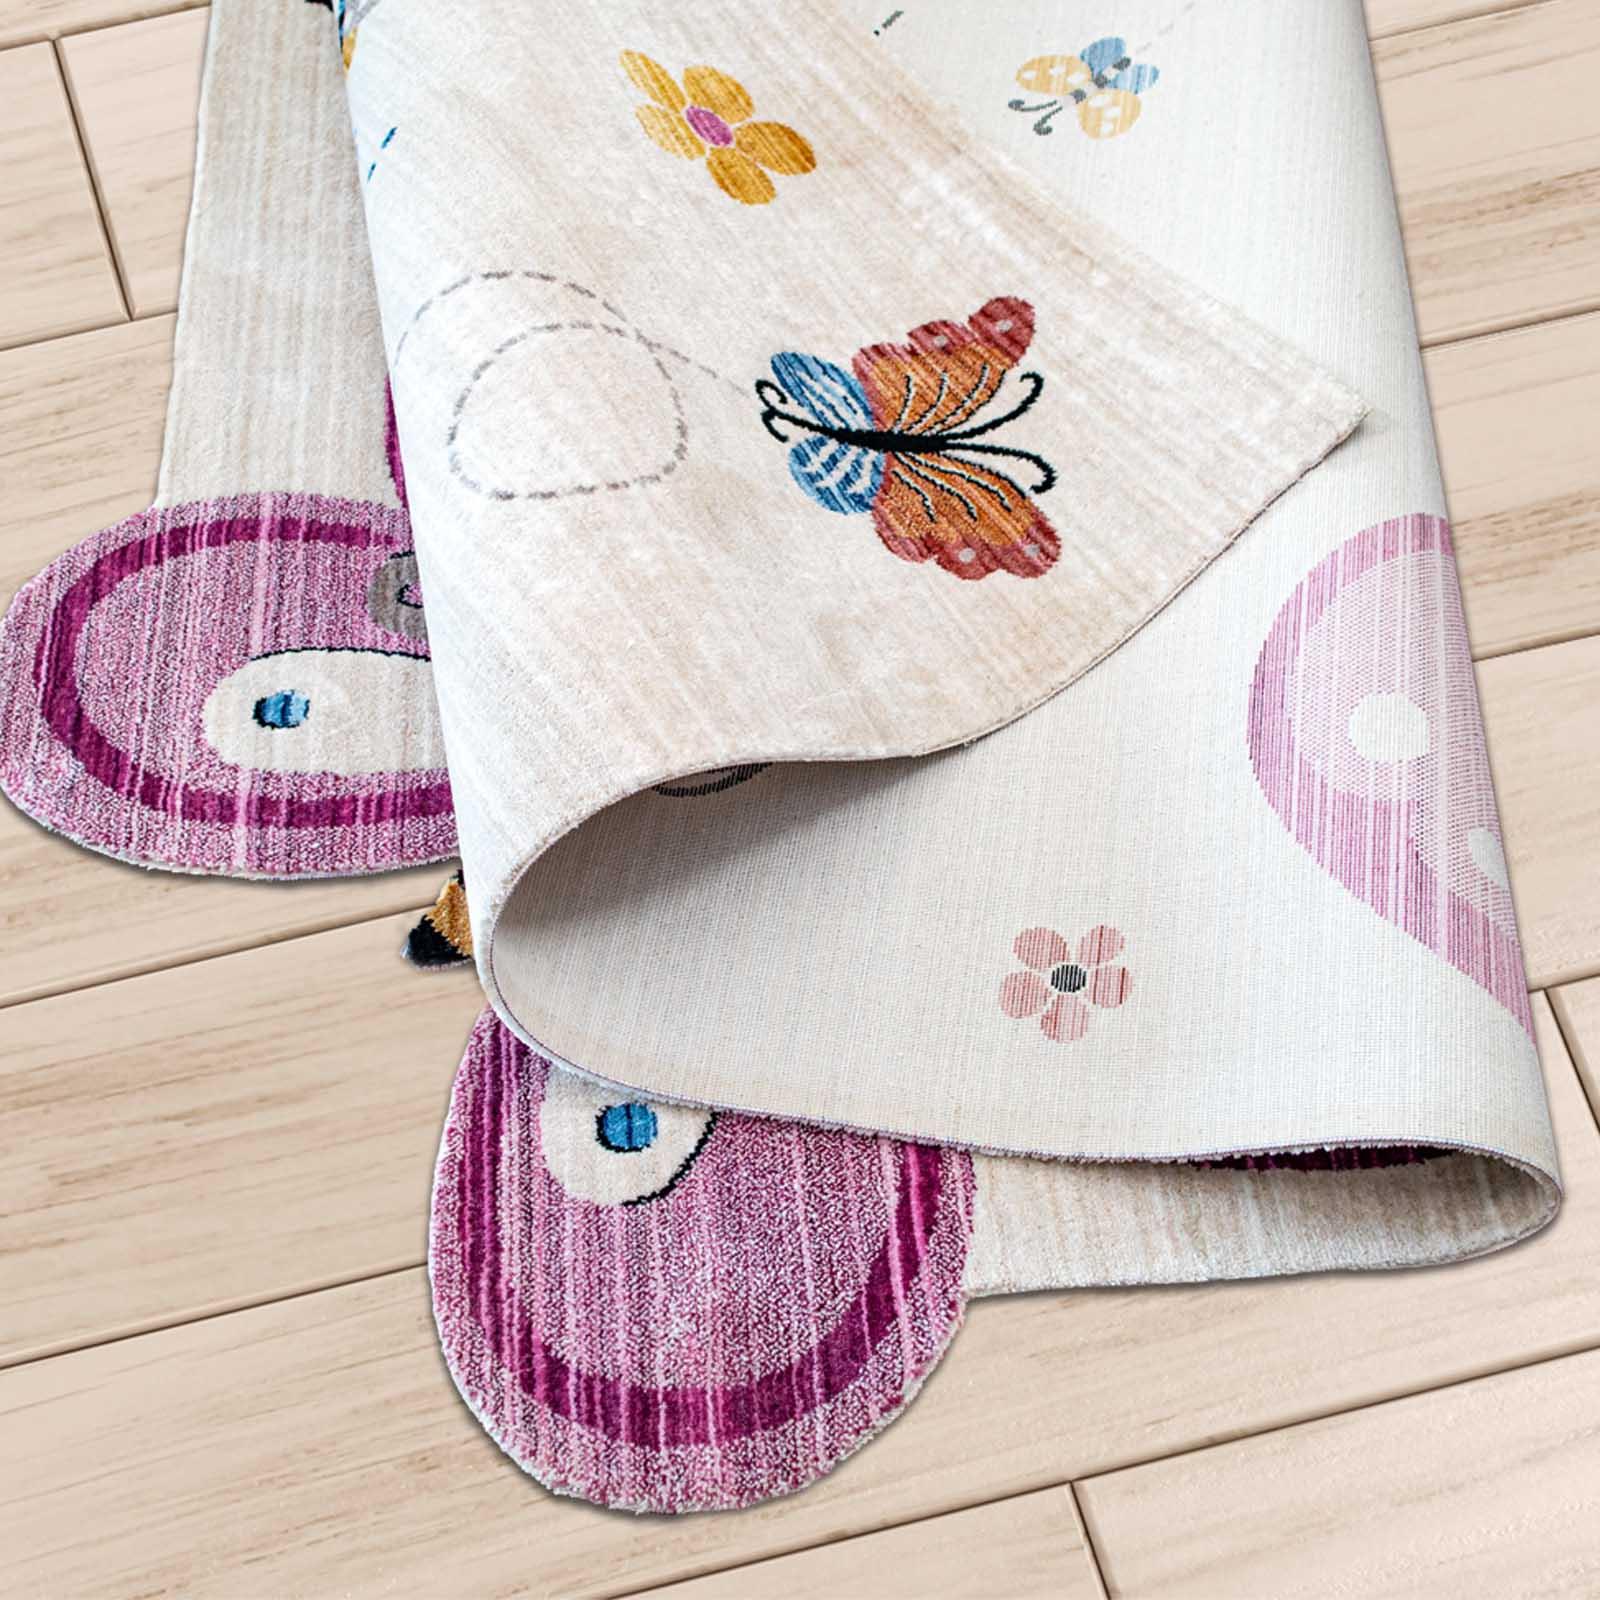 Angora Home Kids Kelebek Desenli Pembe Çocuk Halısı - 5